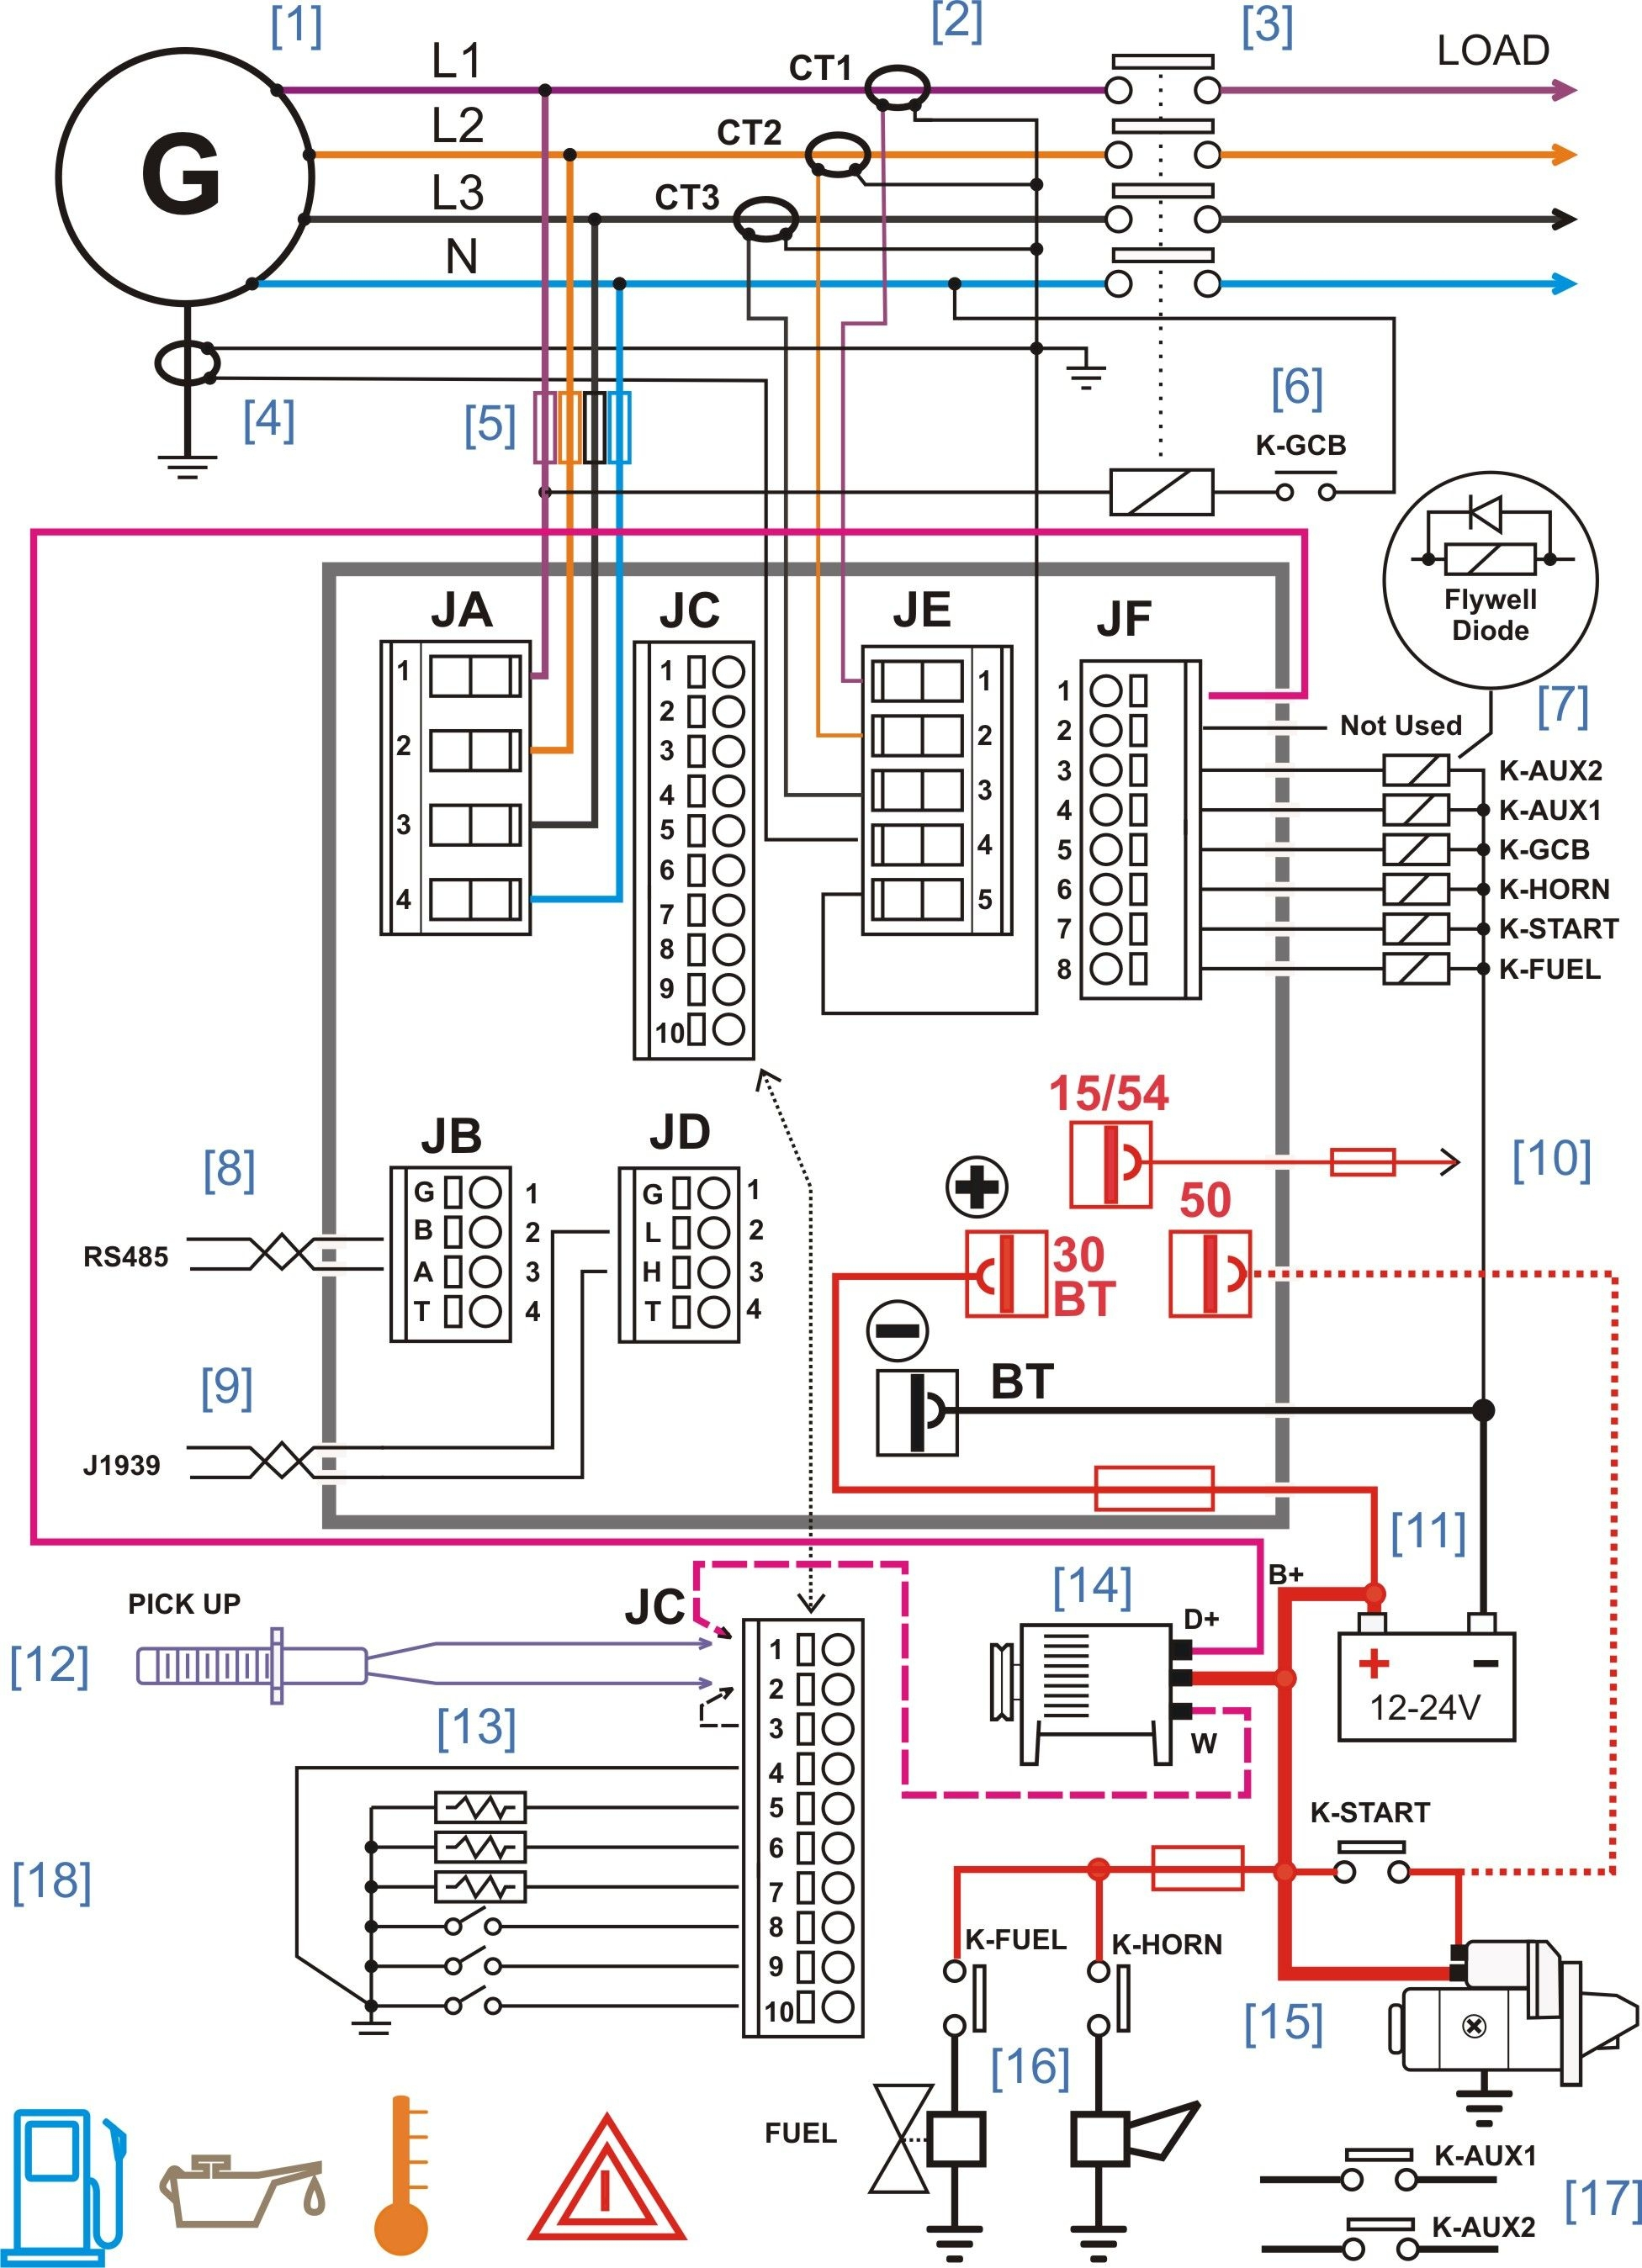 Wiring Diagram Also Onan Generator Remote Start Switch Wiring Diagram